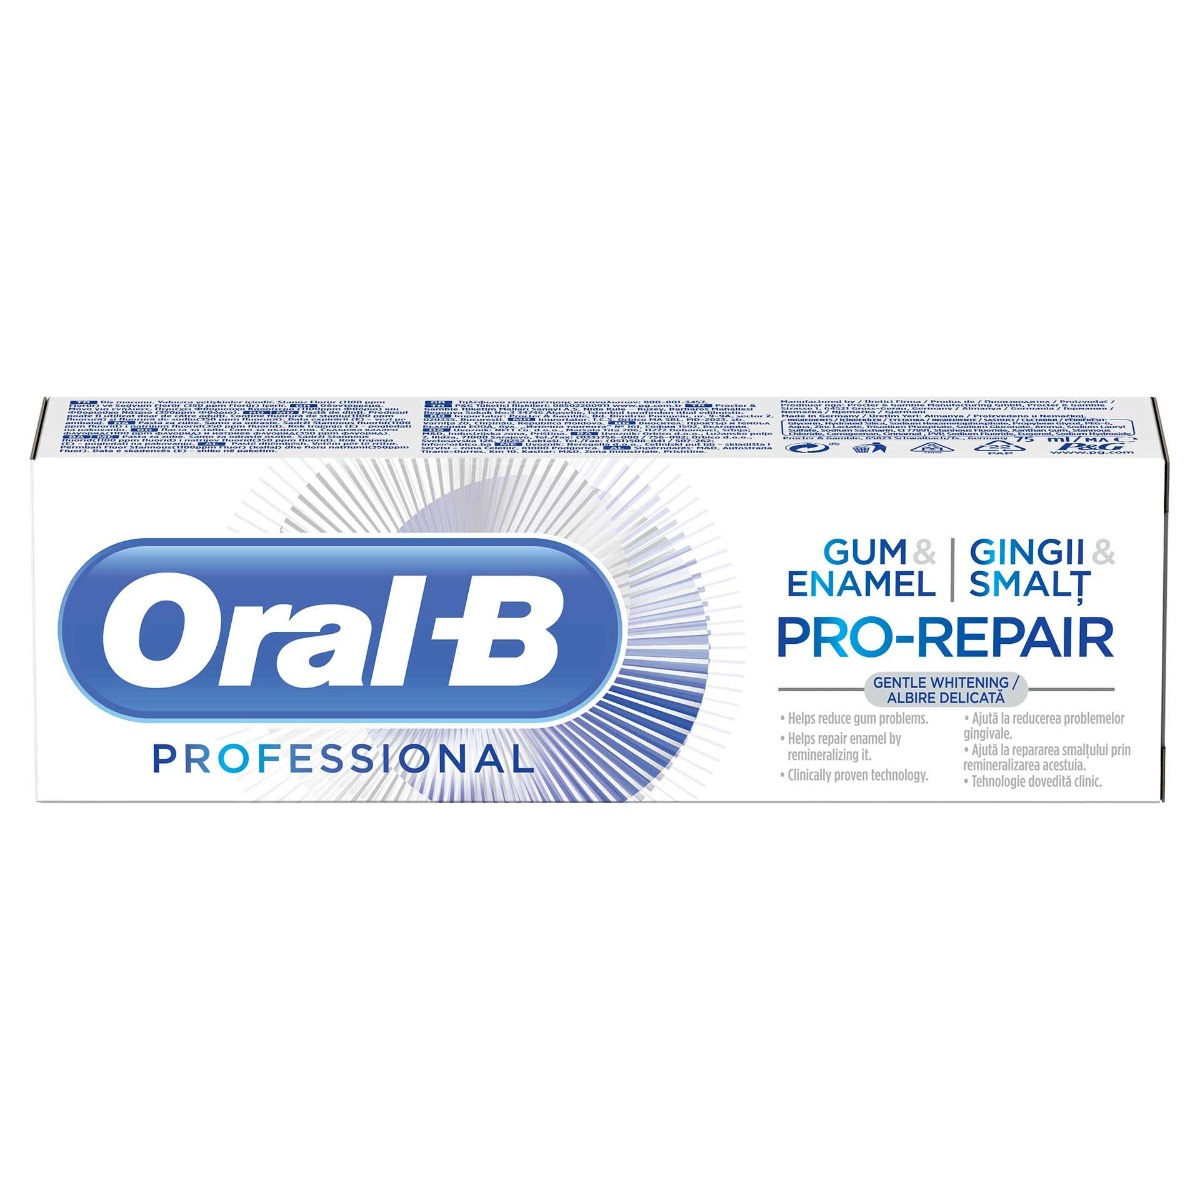 Pasta de dinti Professional Gum&Enamel Pro-Repair Gentle Whitening, 75ml, Oral-B drmax.ro